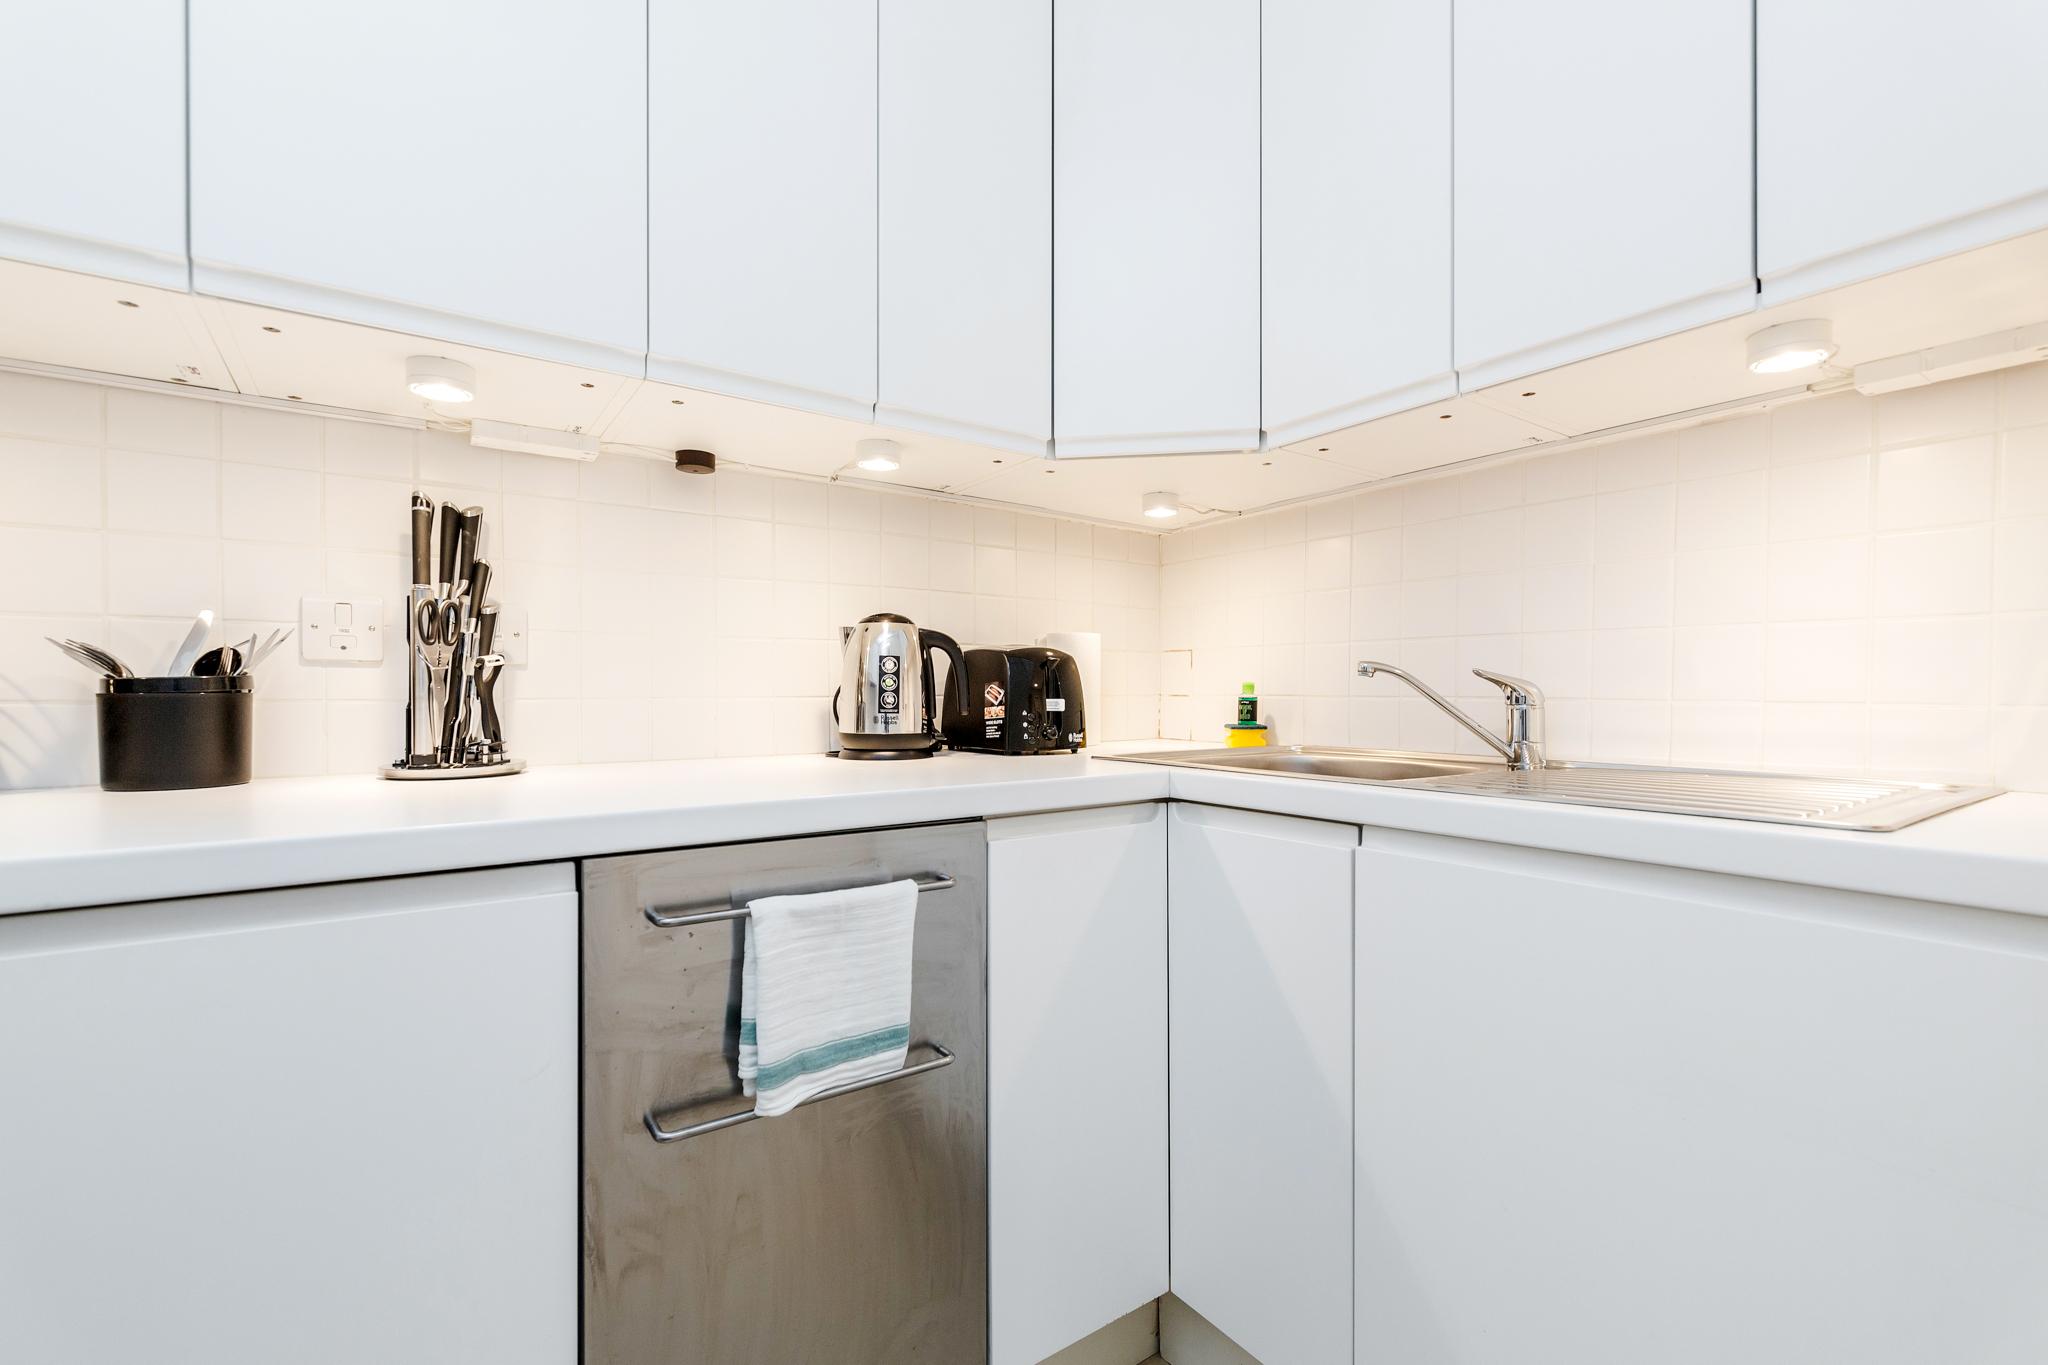 Apartment Distinctive Kensington apt for 3 with Mezzanine photo 23290240